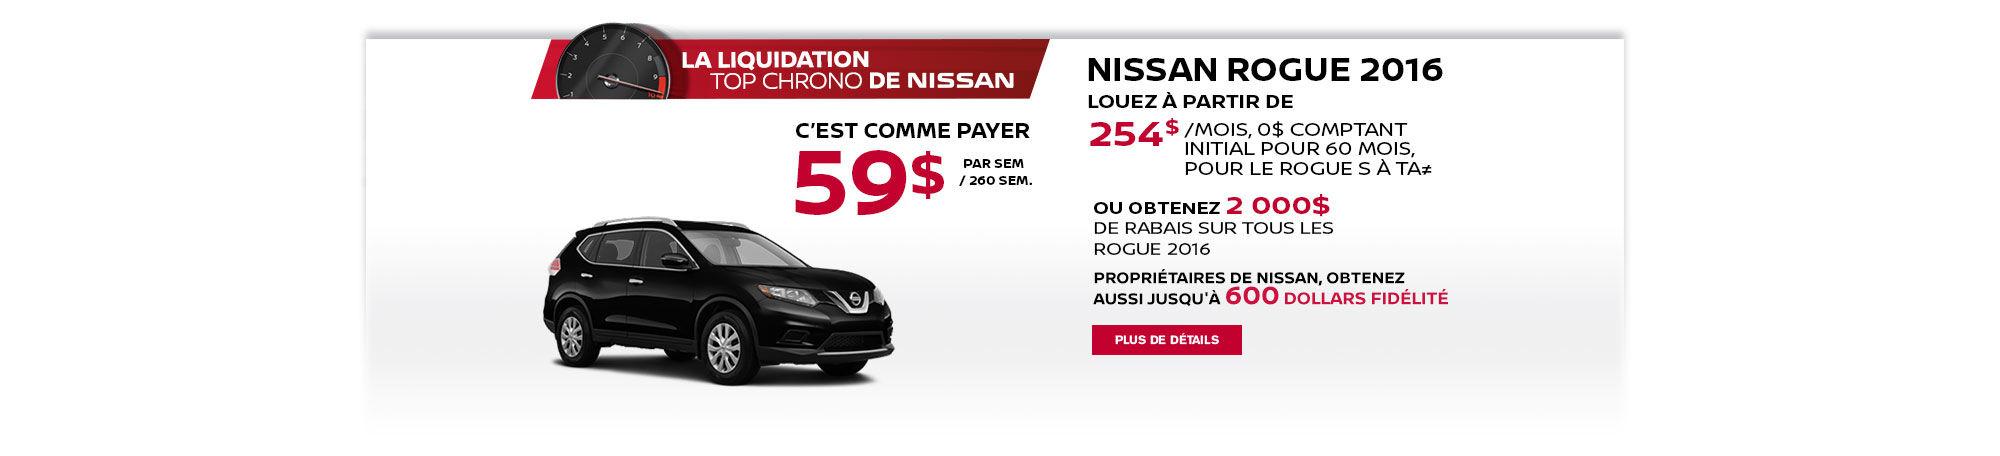 La liquidation top chrono de Nissan - Rogue